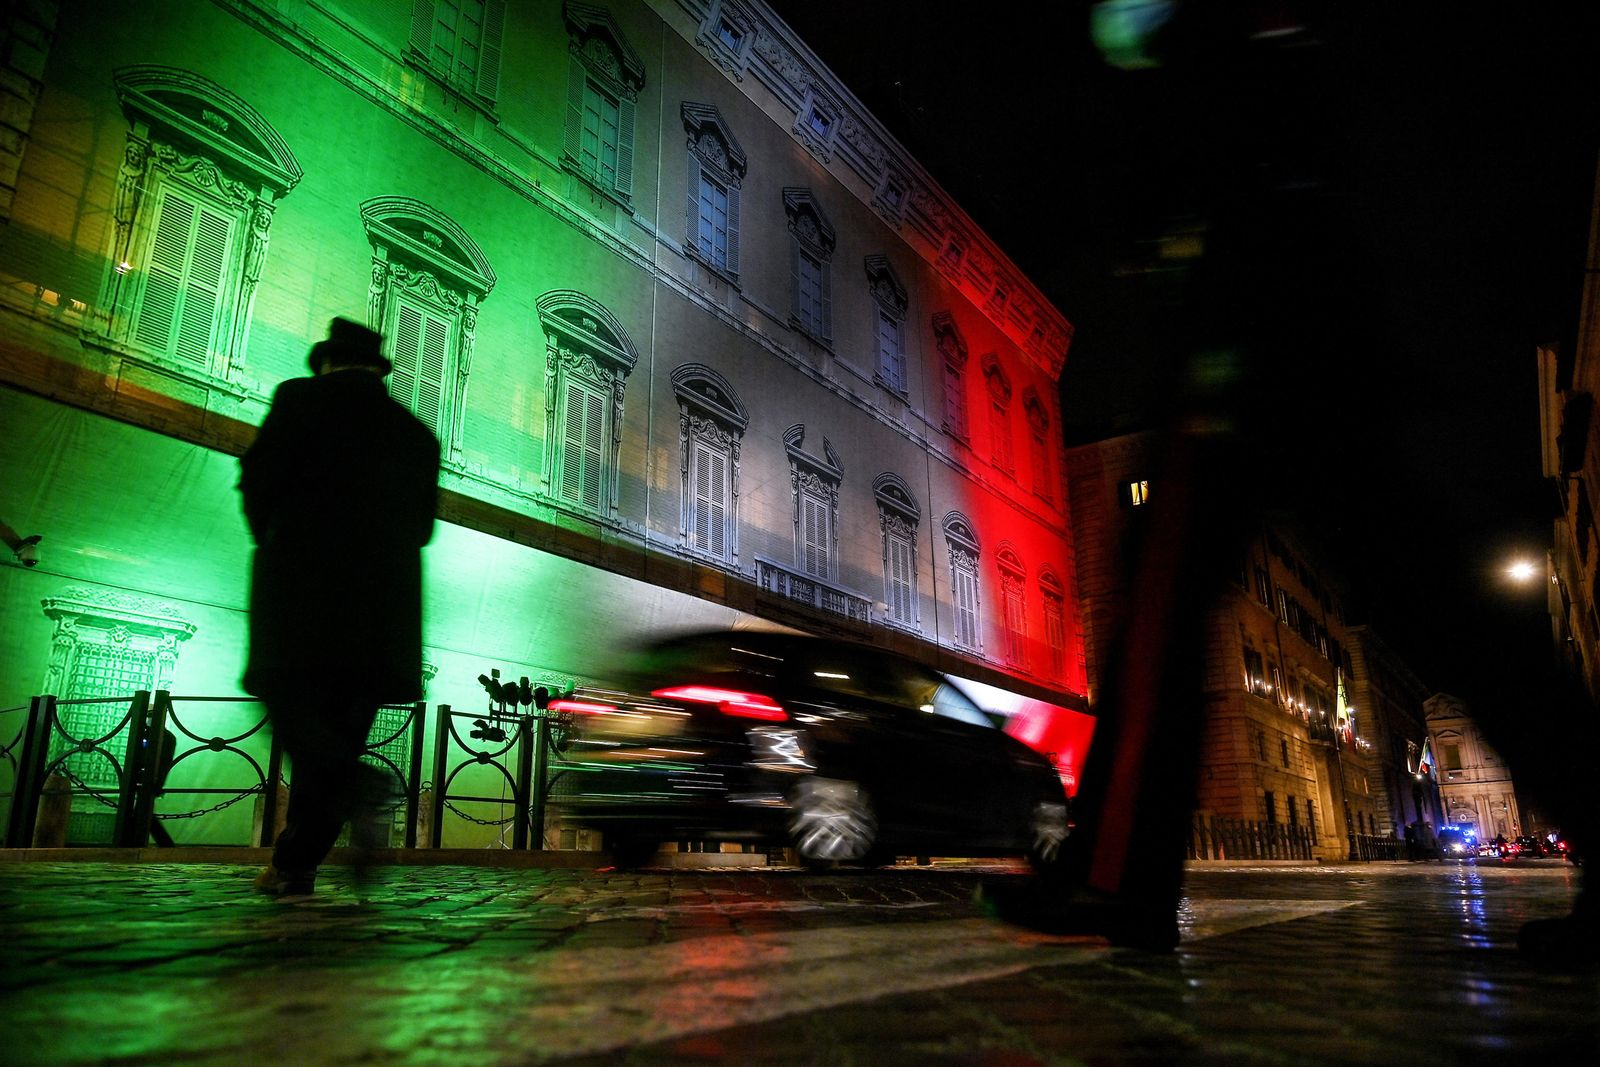 Mario Draghi's Government faces confidence vote at the Senate, Rome, Italy - 17 Feb 2021